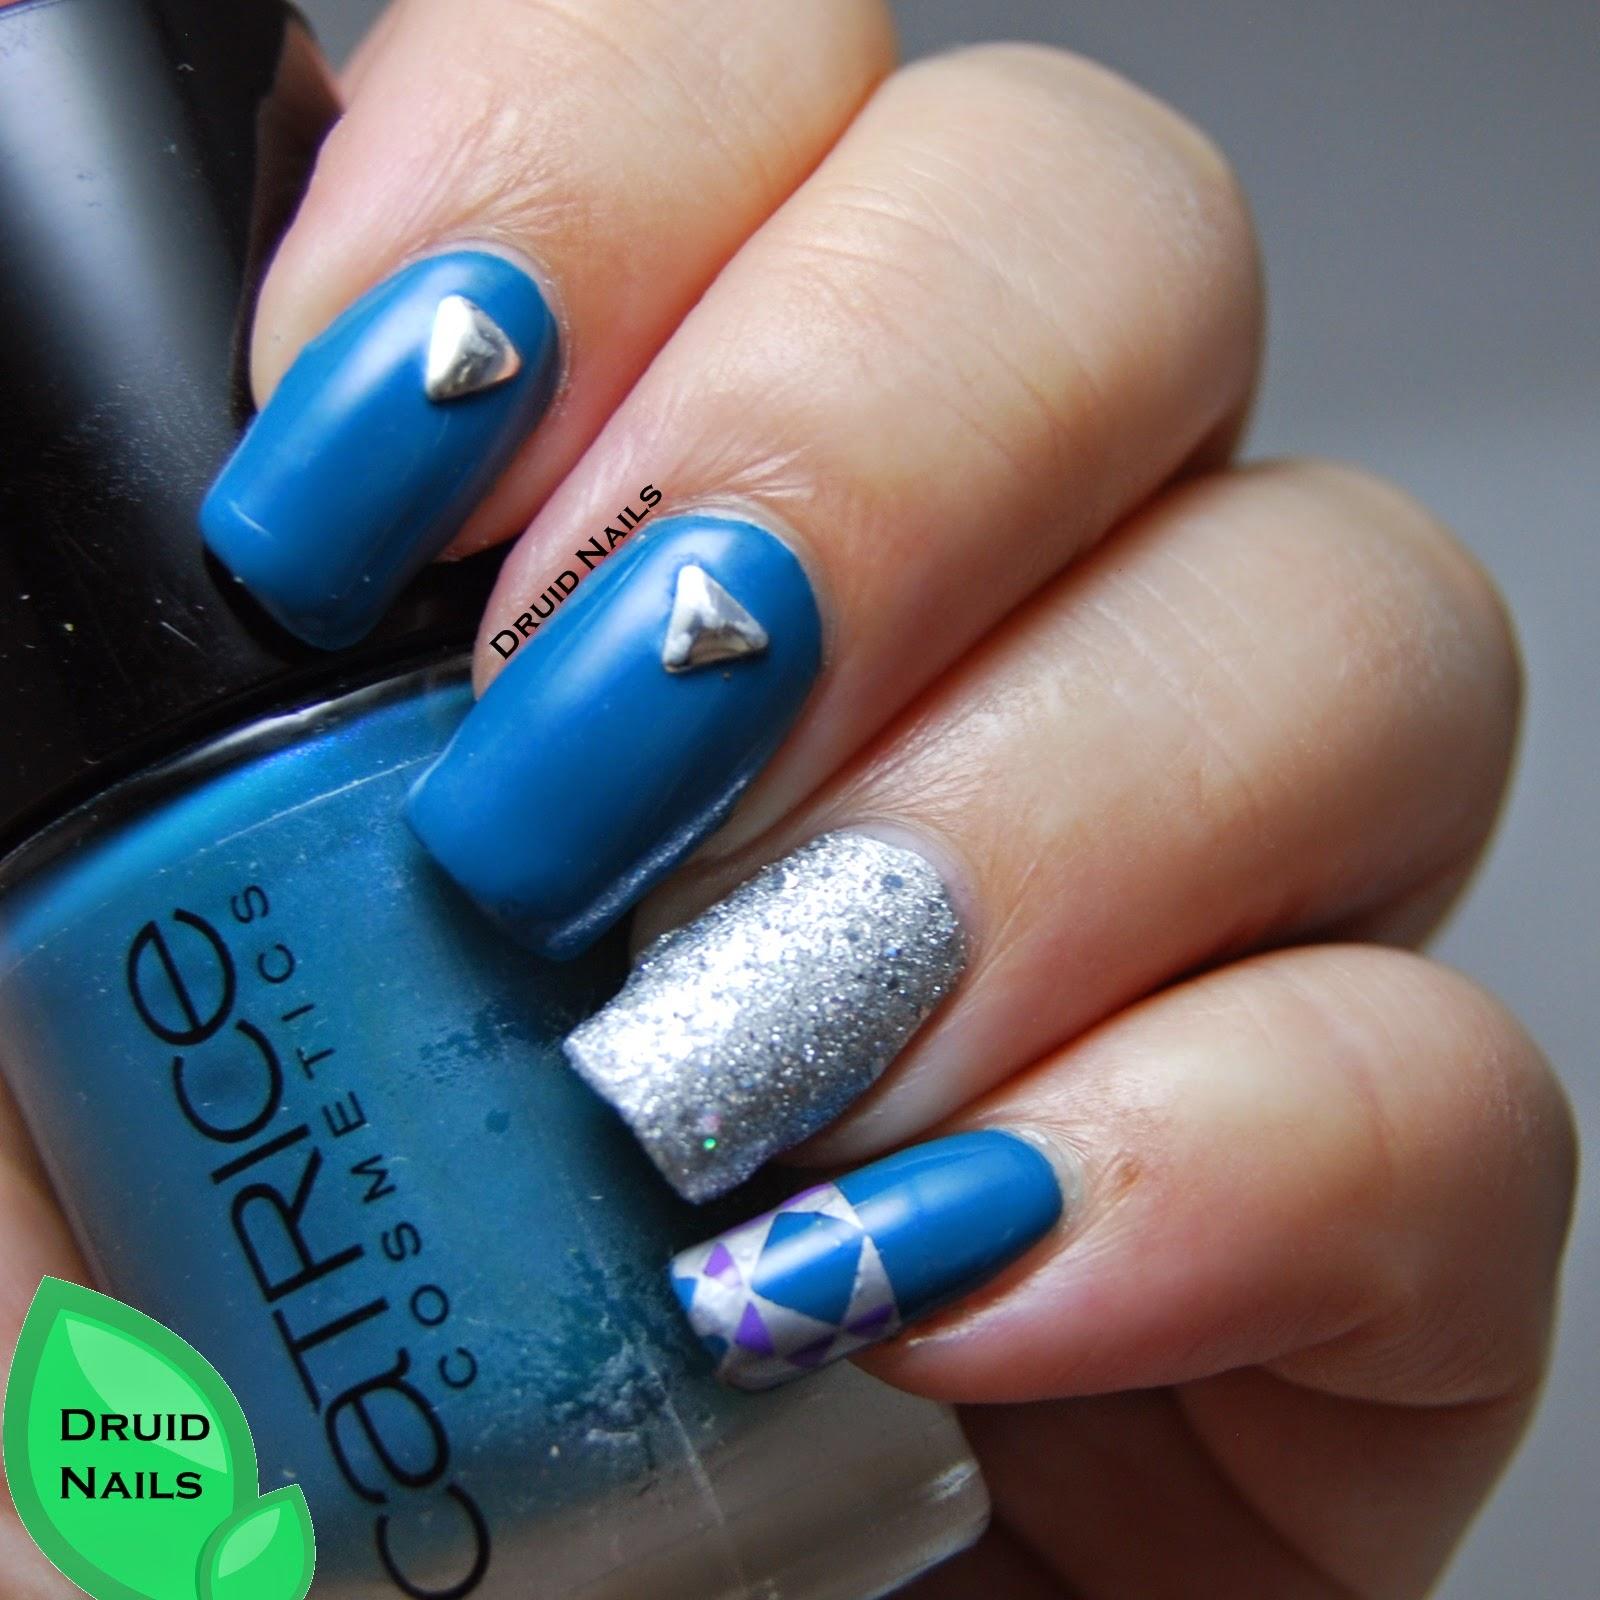 Tuesday Nail Polish: Druid Nails: Tri Polish Tuesday